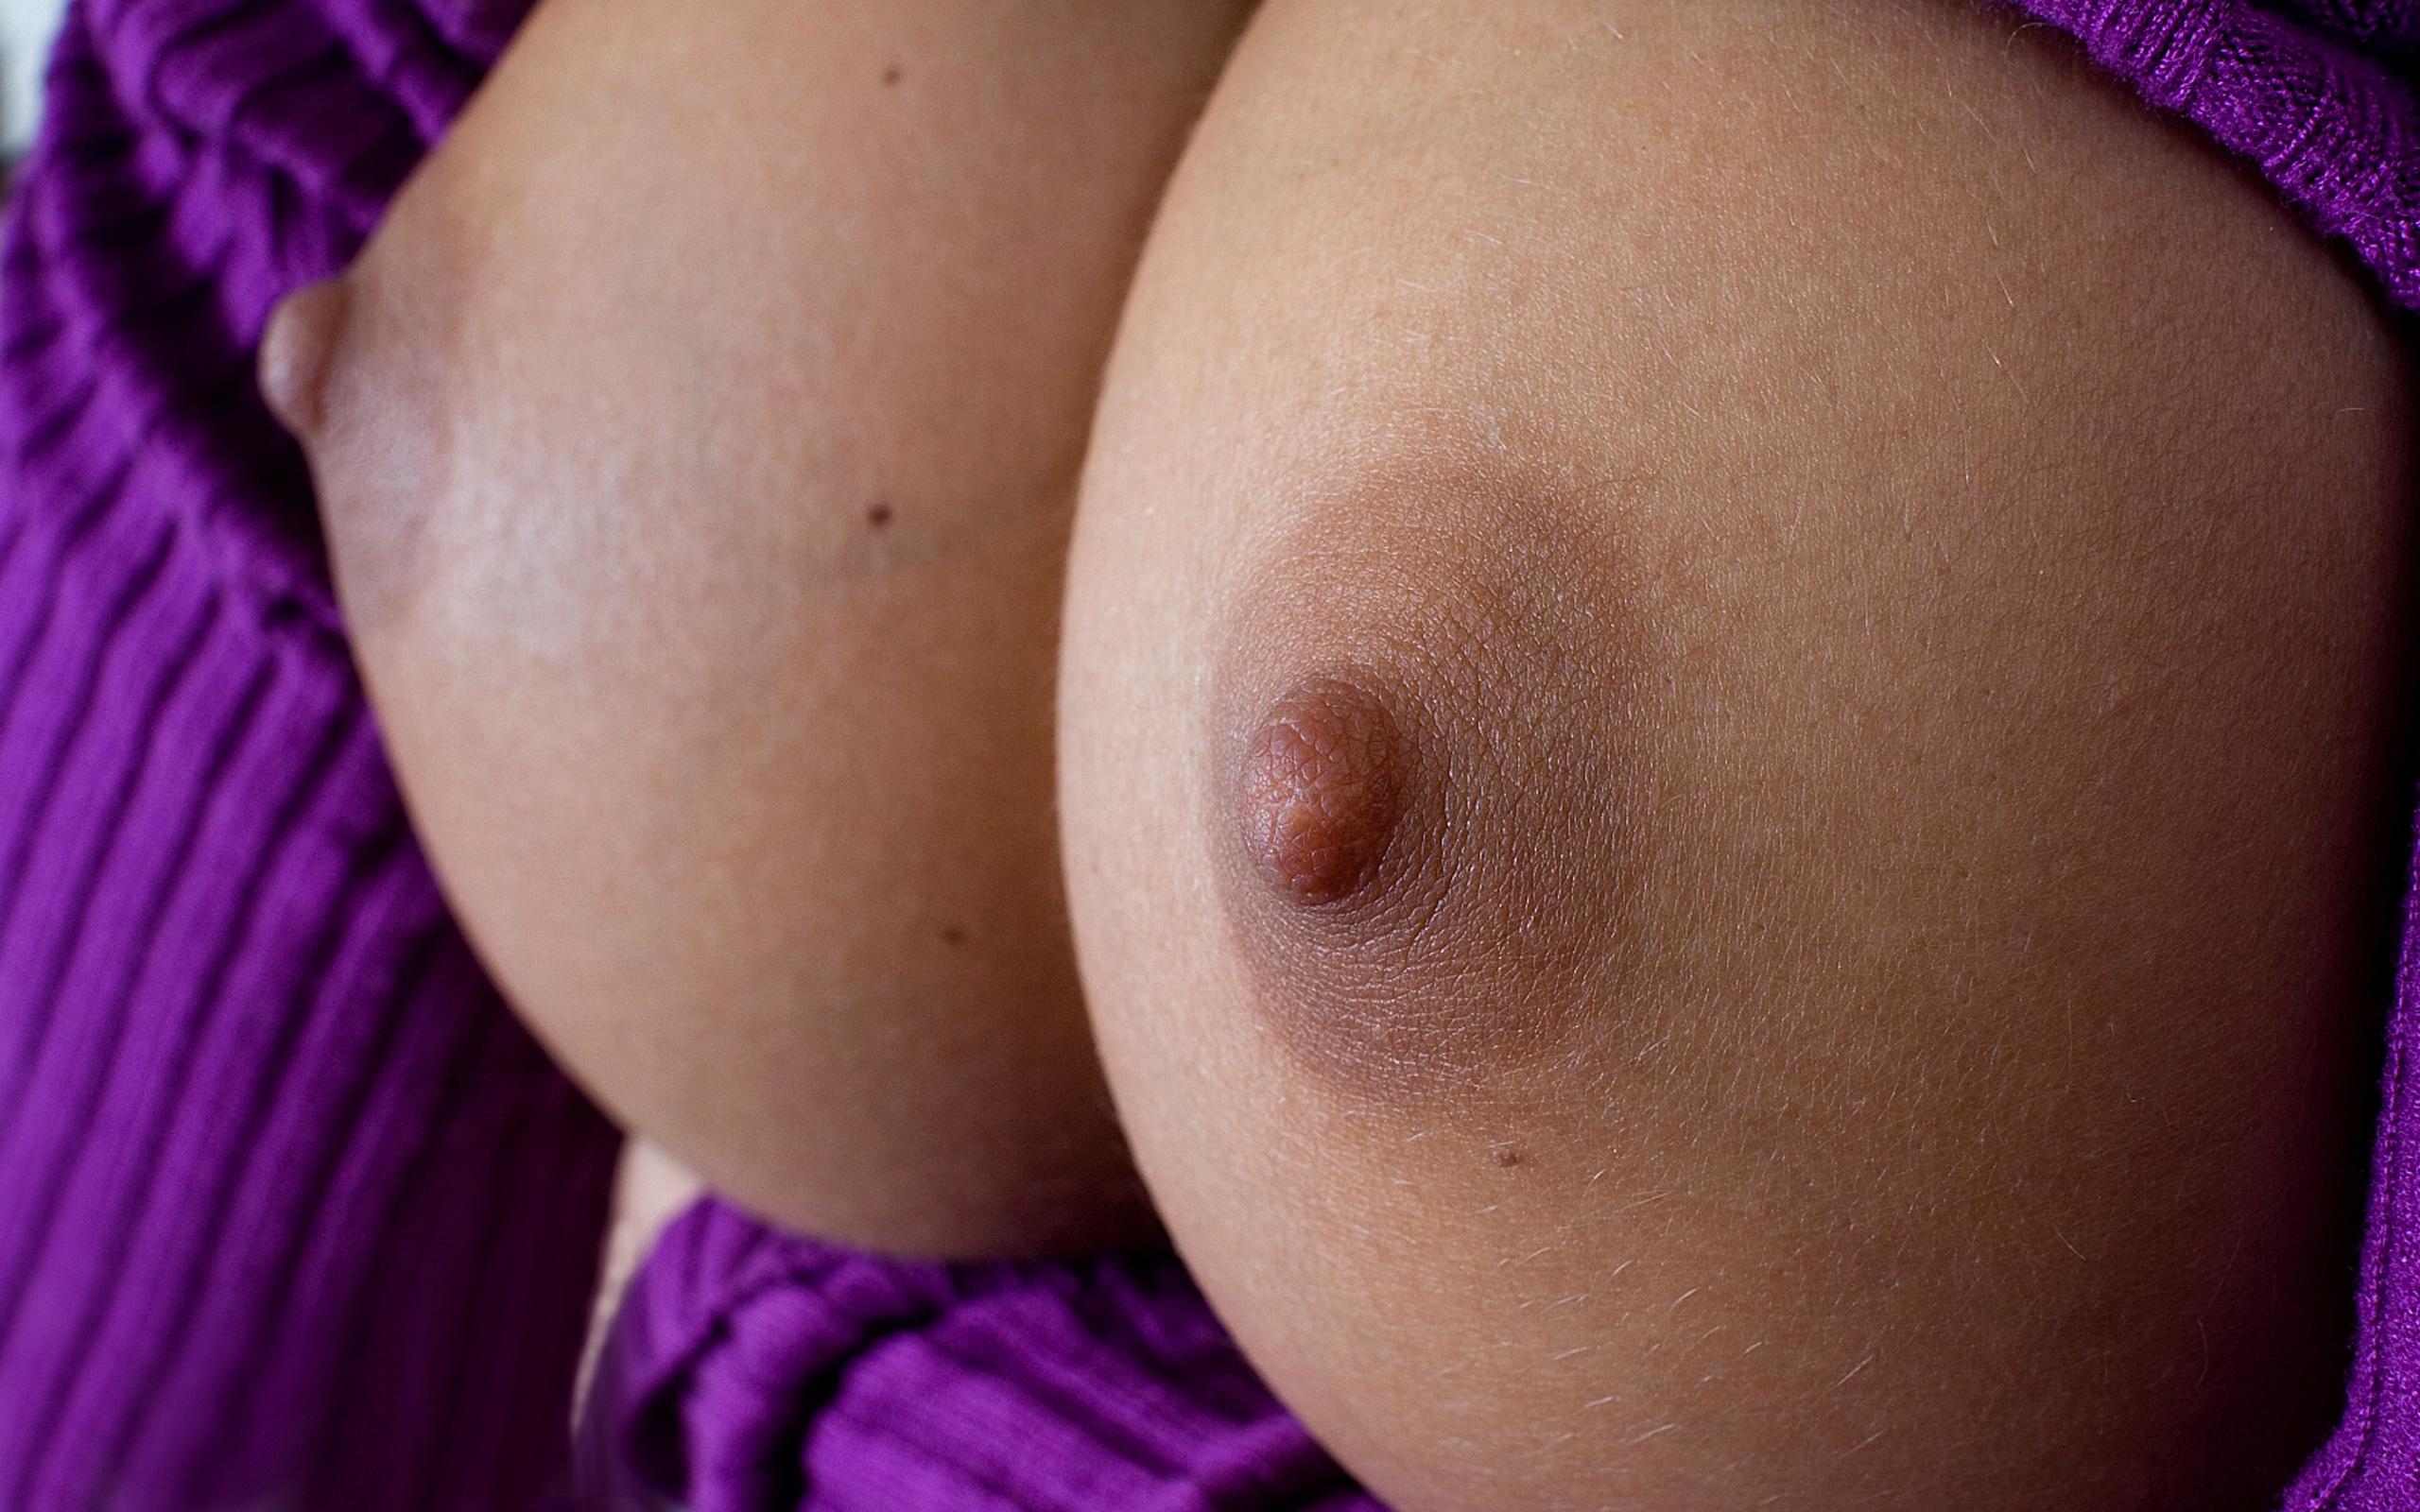 Соски груди онлайн 8 фотография